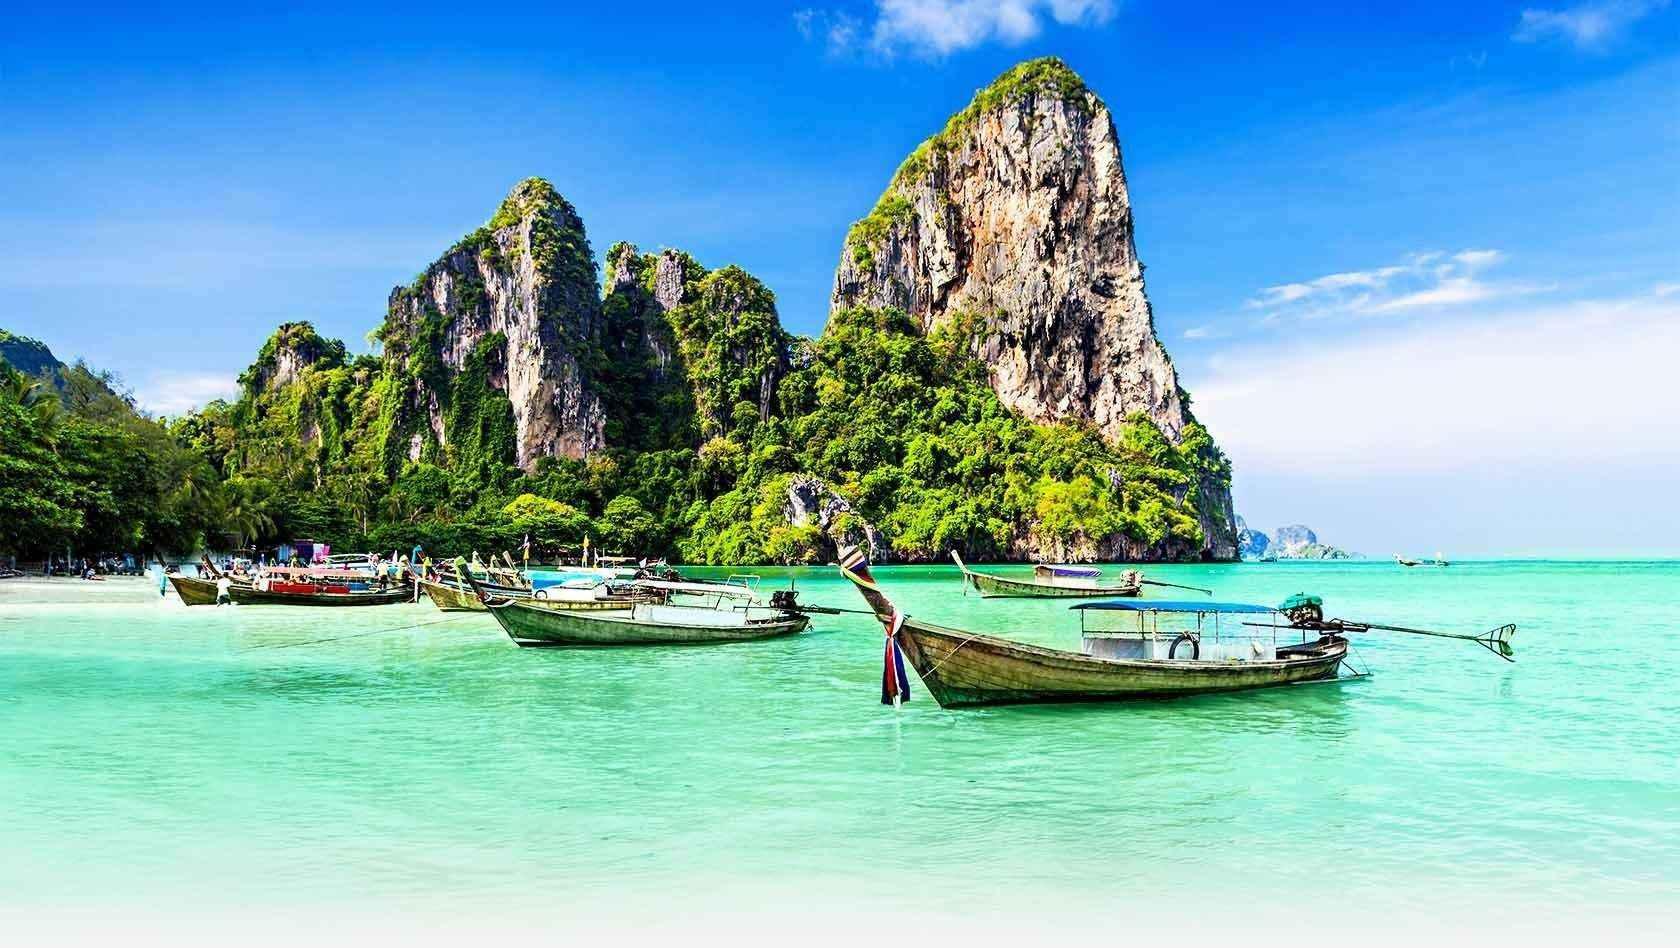 tour du lịch thái lan hè 2017